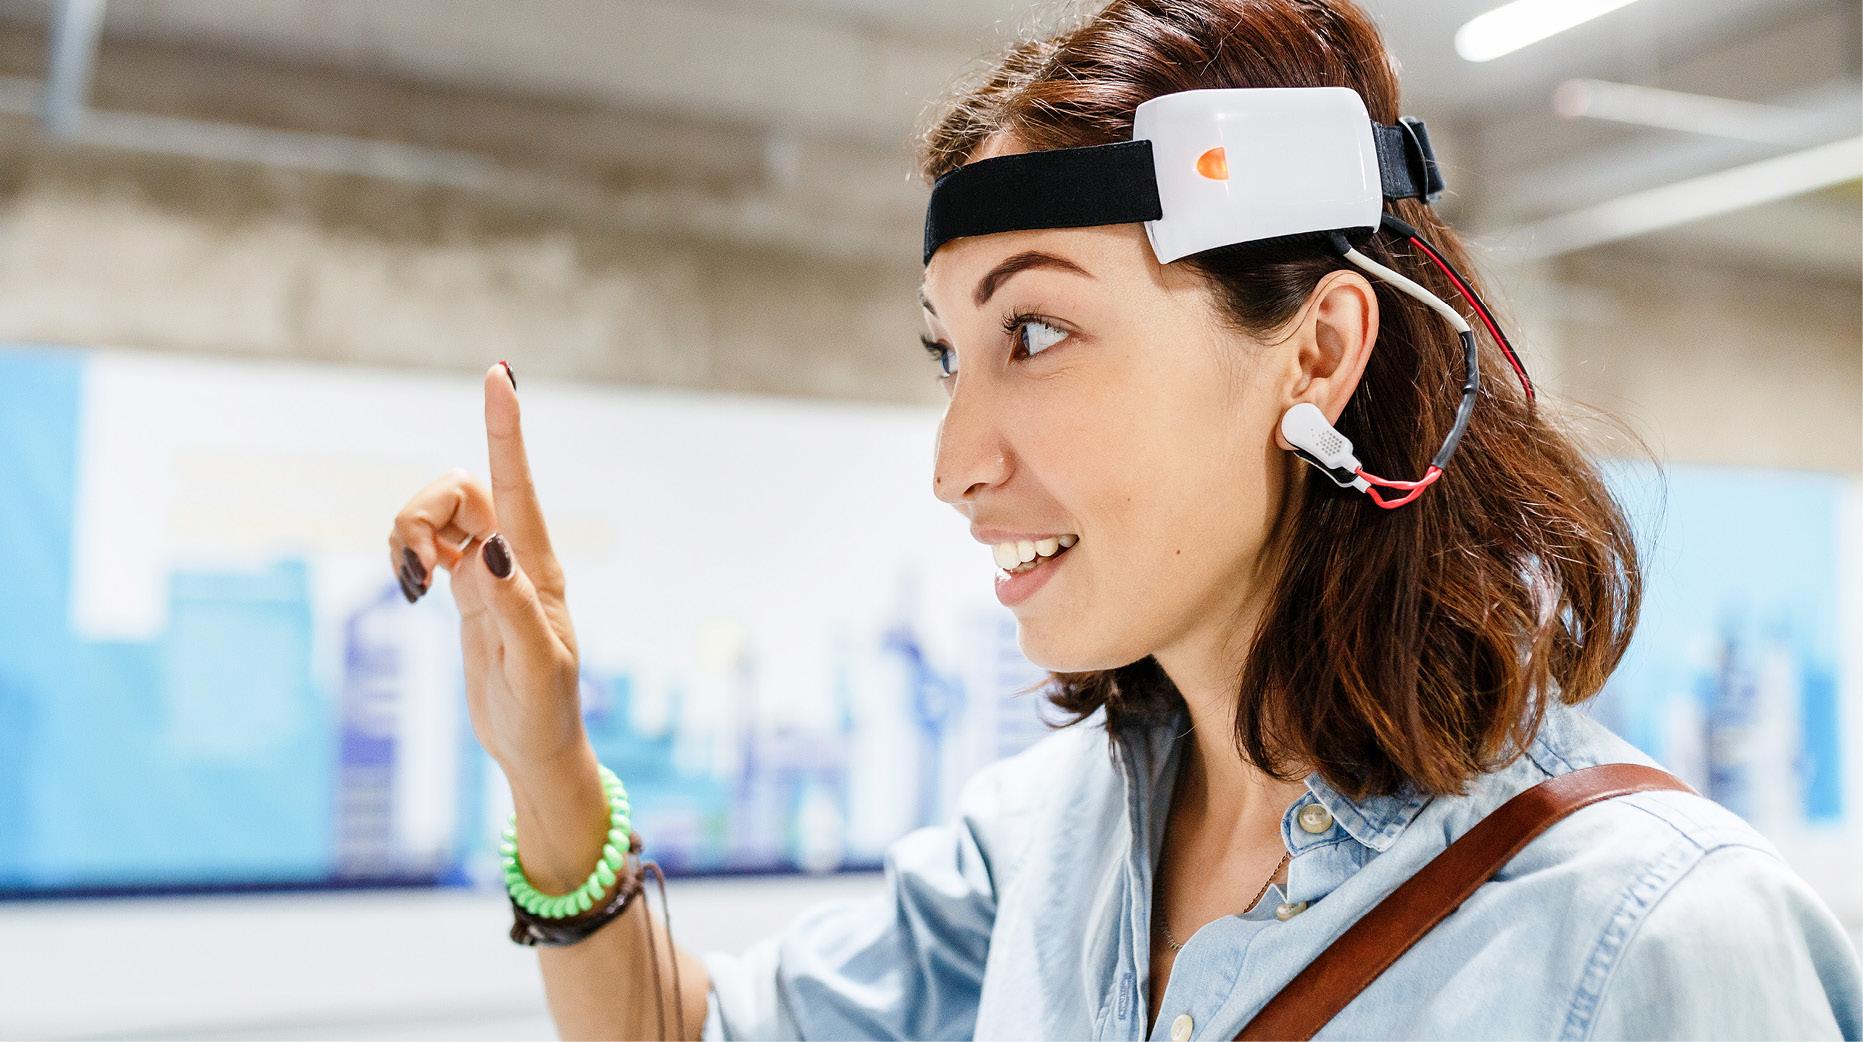 _hero-image-Using Neurofeedback Devices to Retrain Your Brain